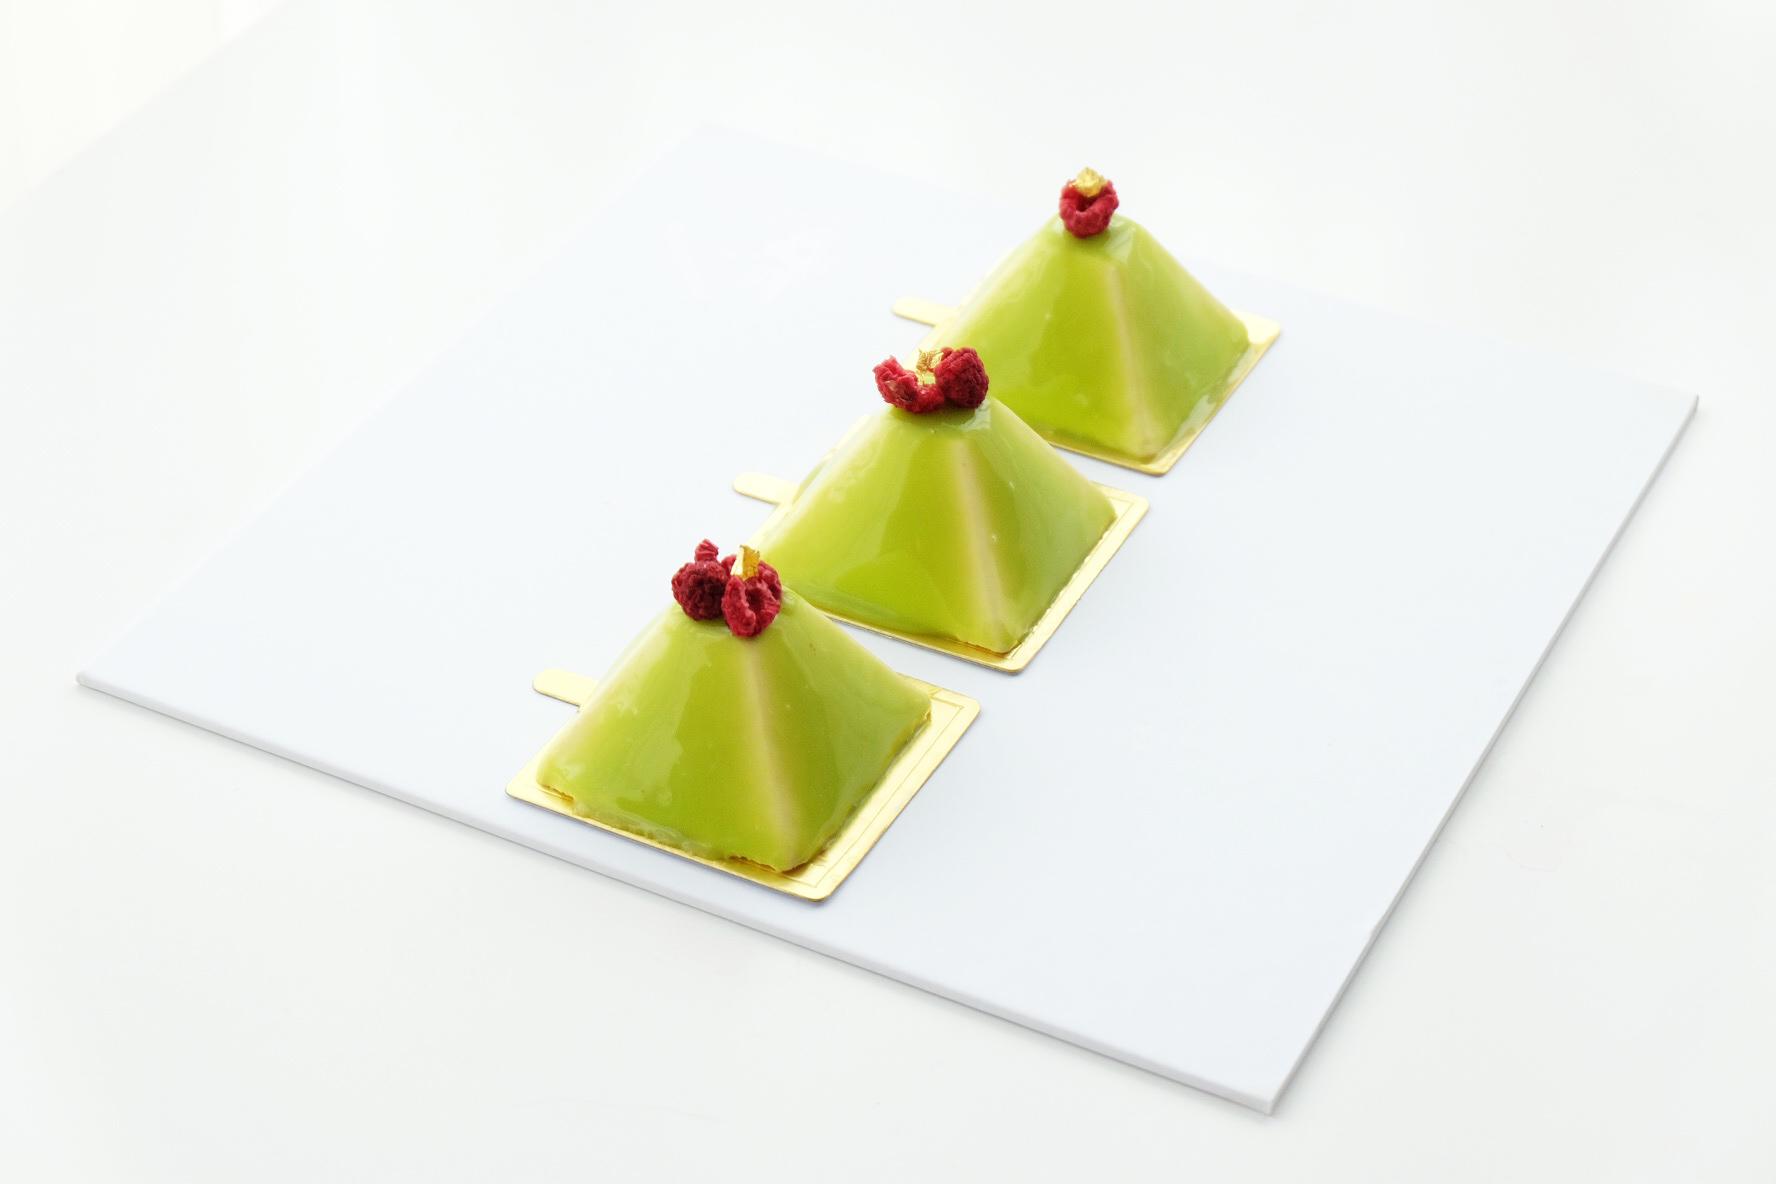 White Chocolate and Lemon Gateau